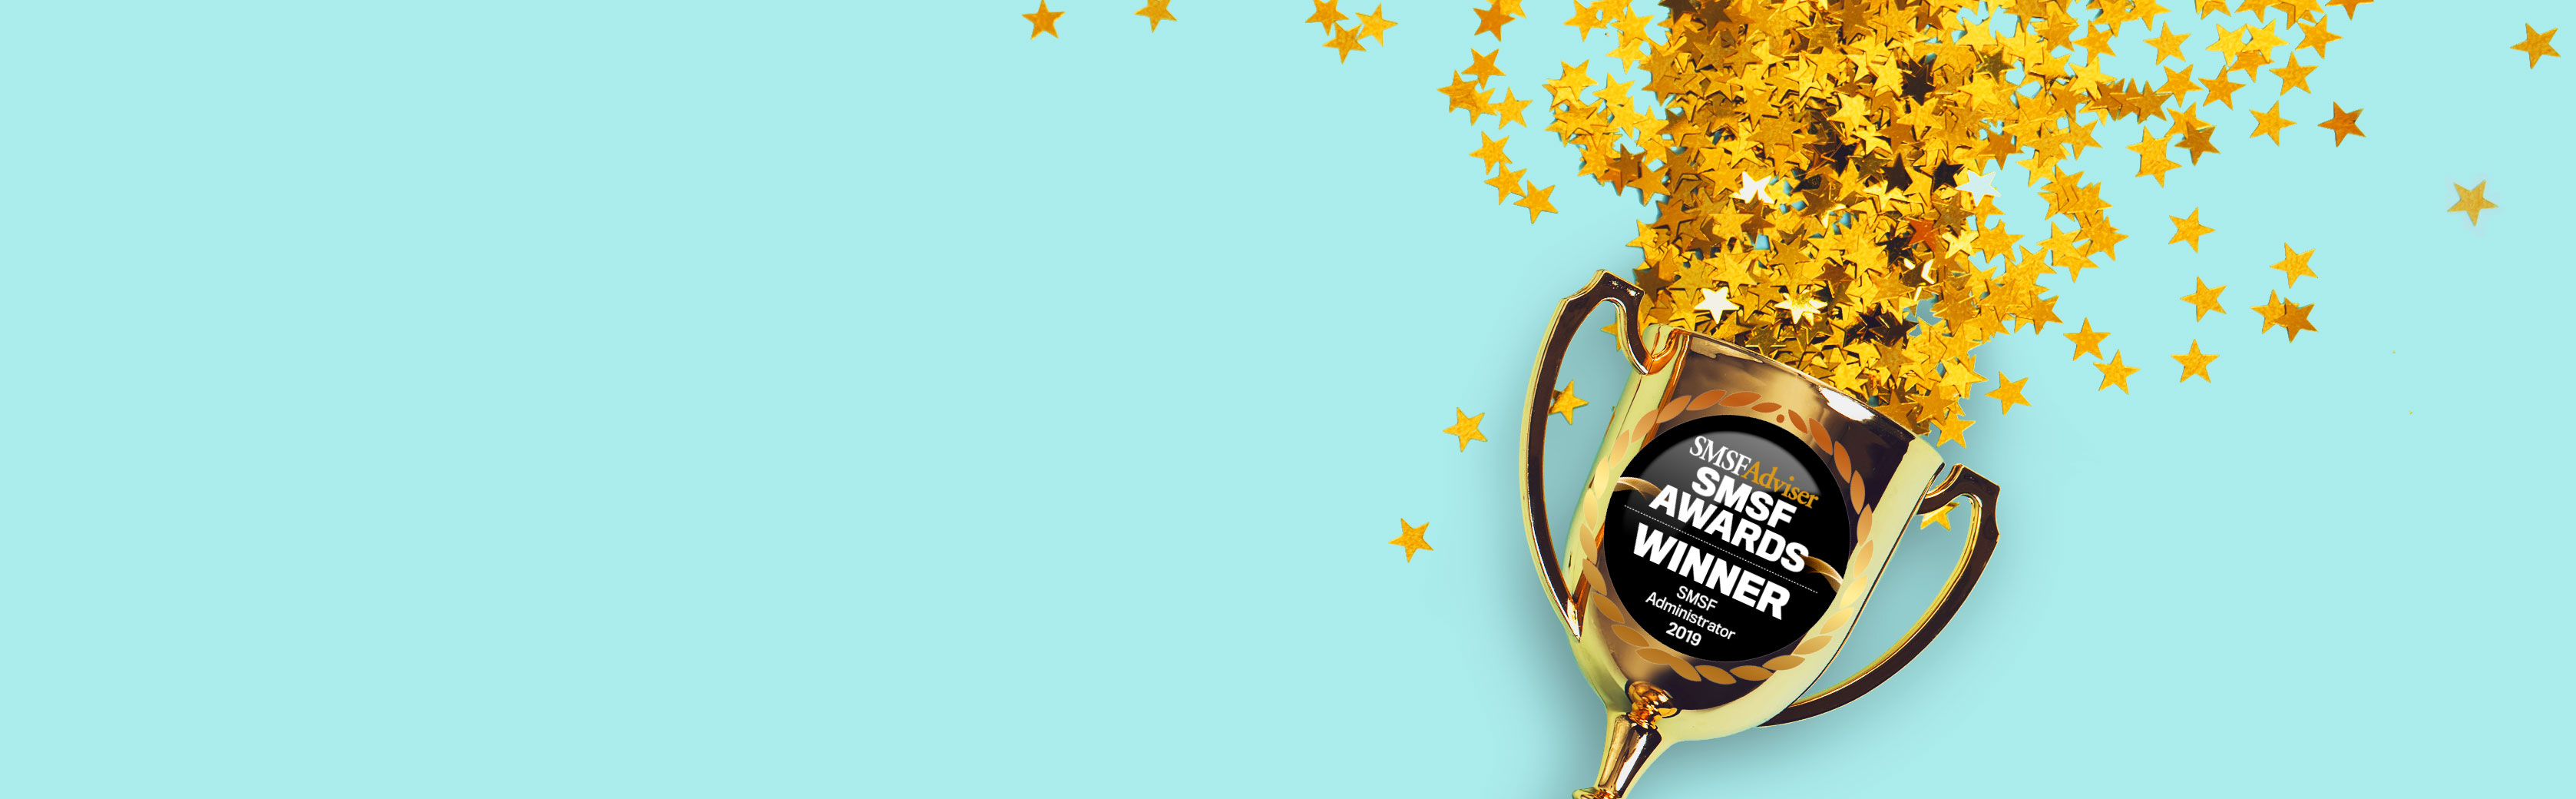 heffron-wins-gold